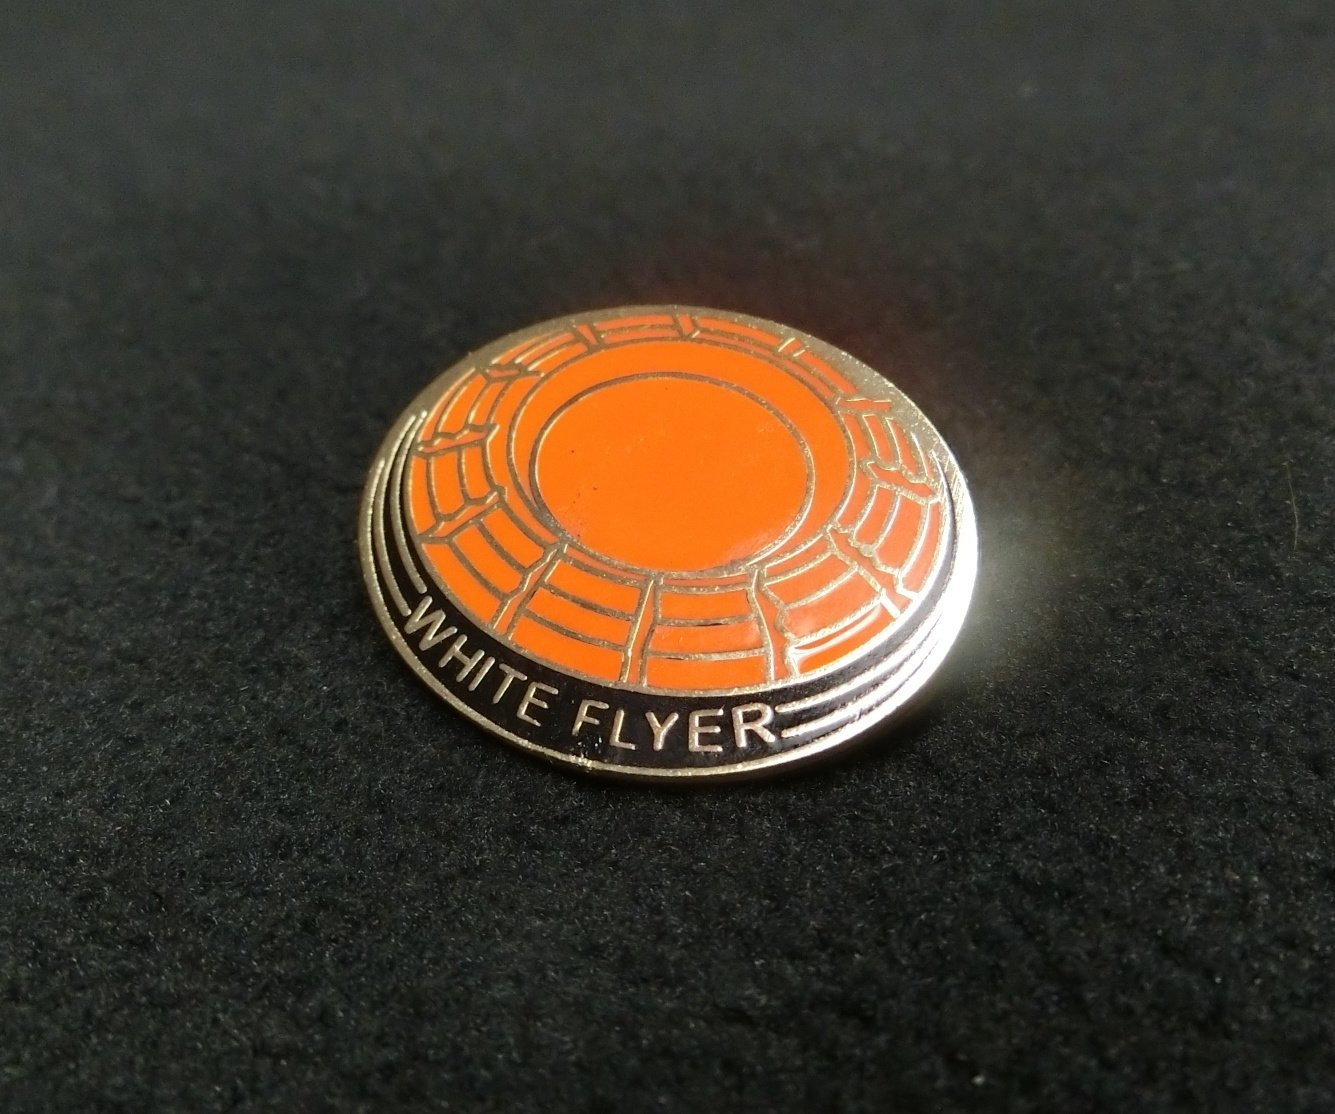 White Flyer Hard Enamel Pin